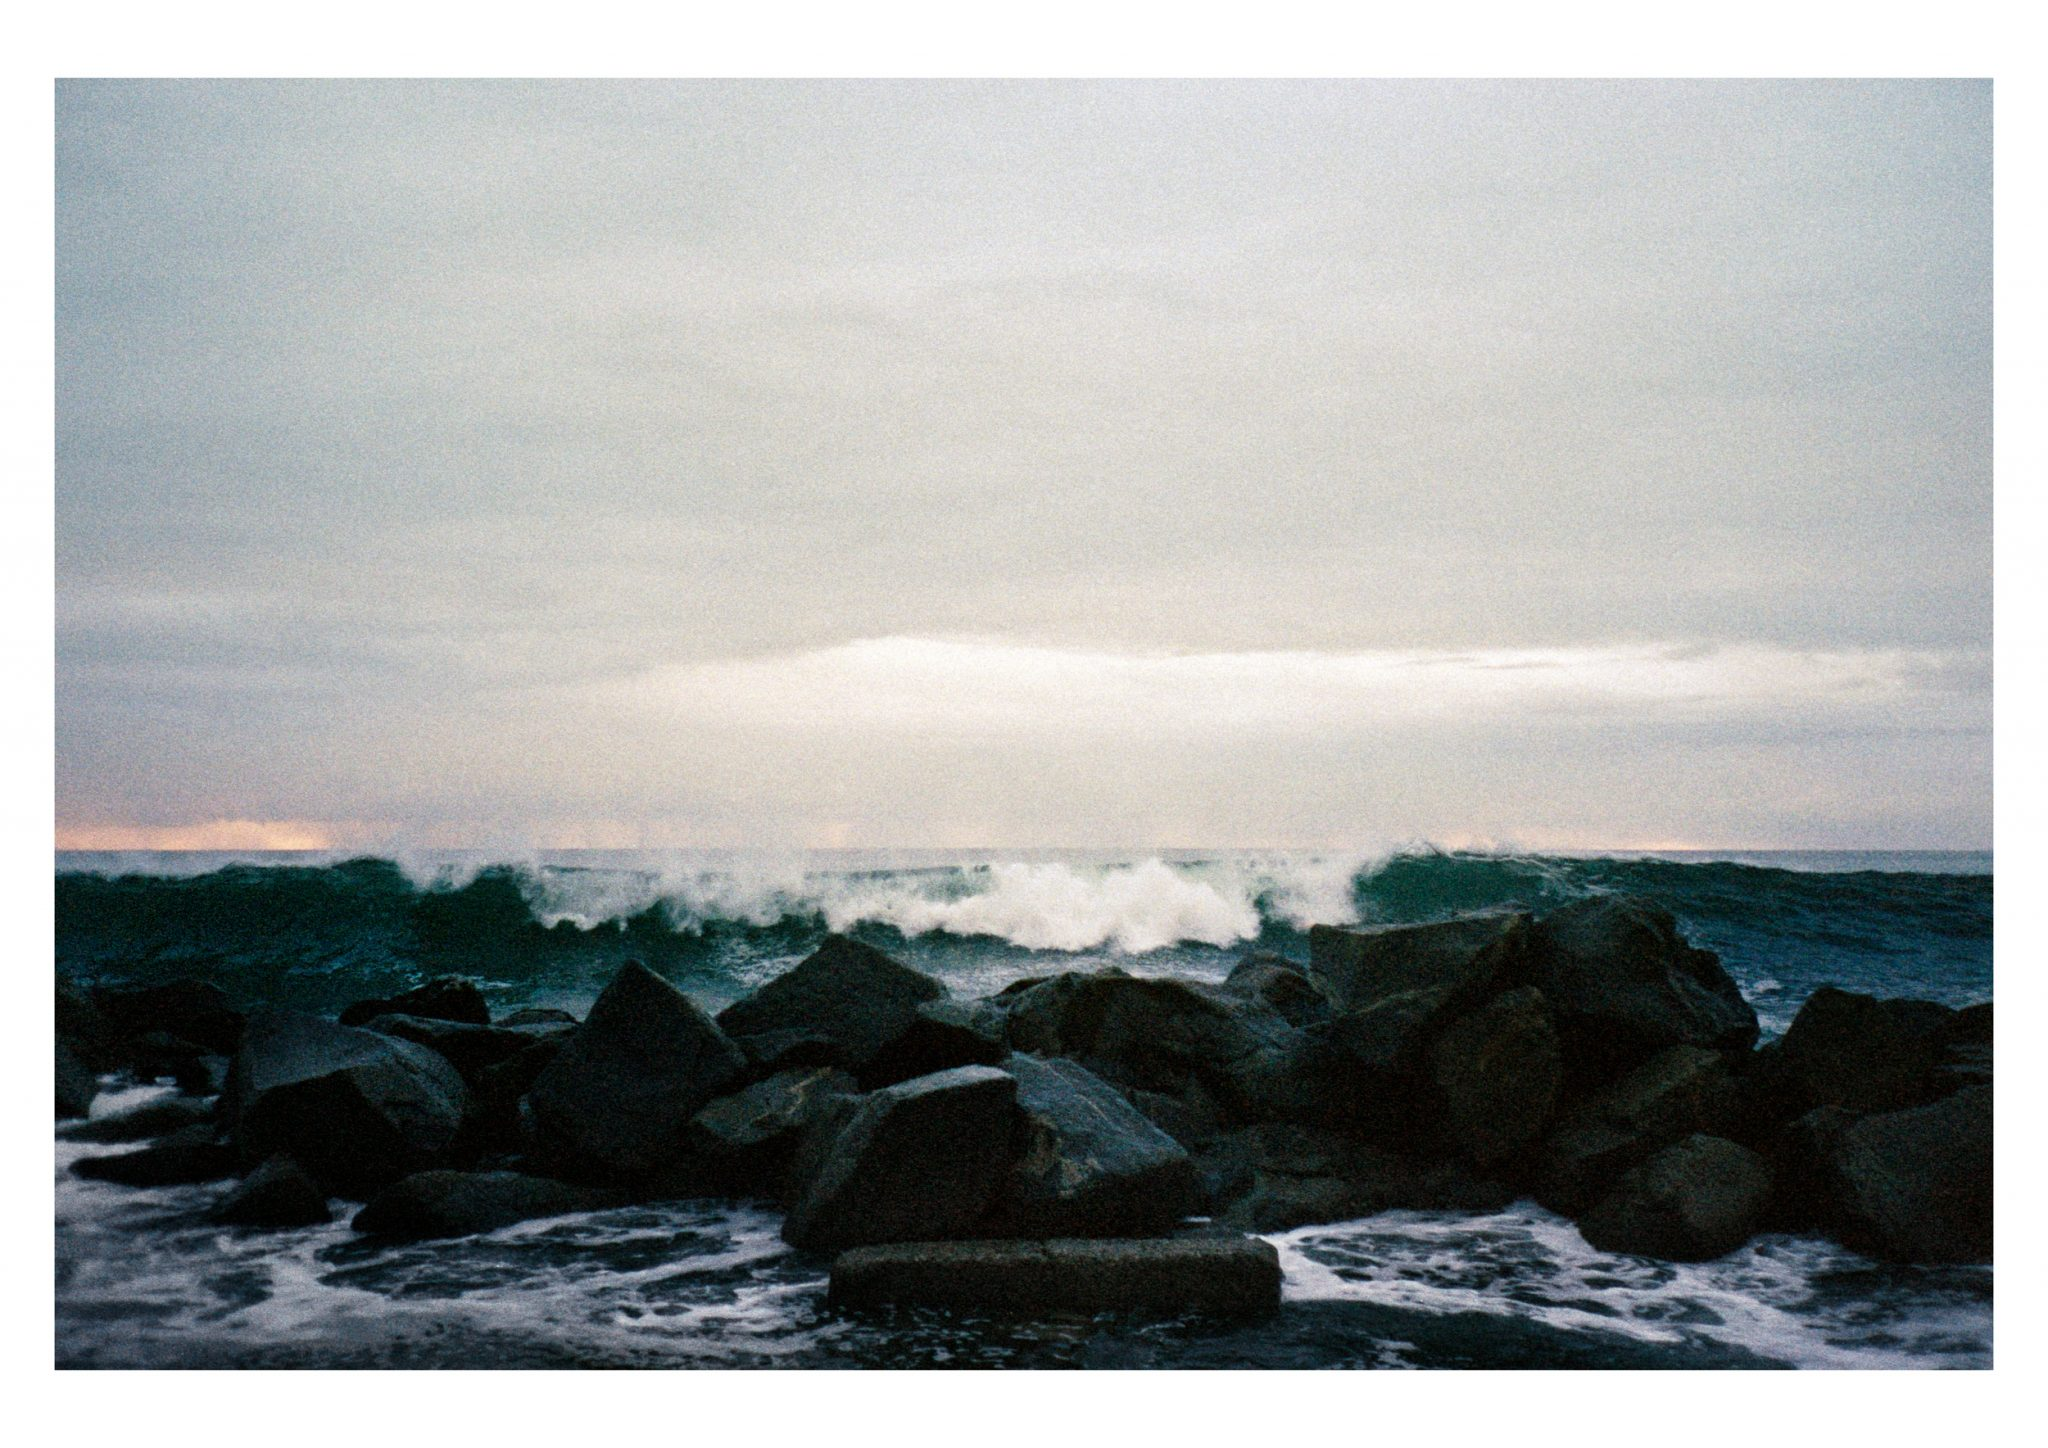 WaveBreak_A2_1